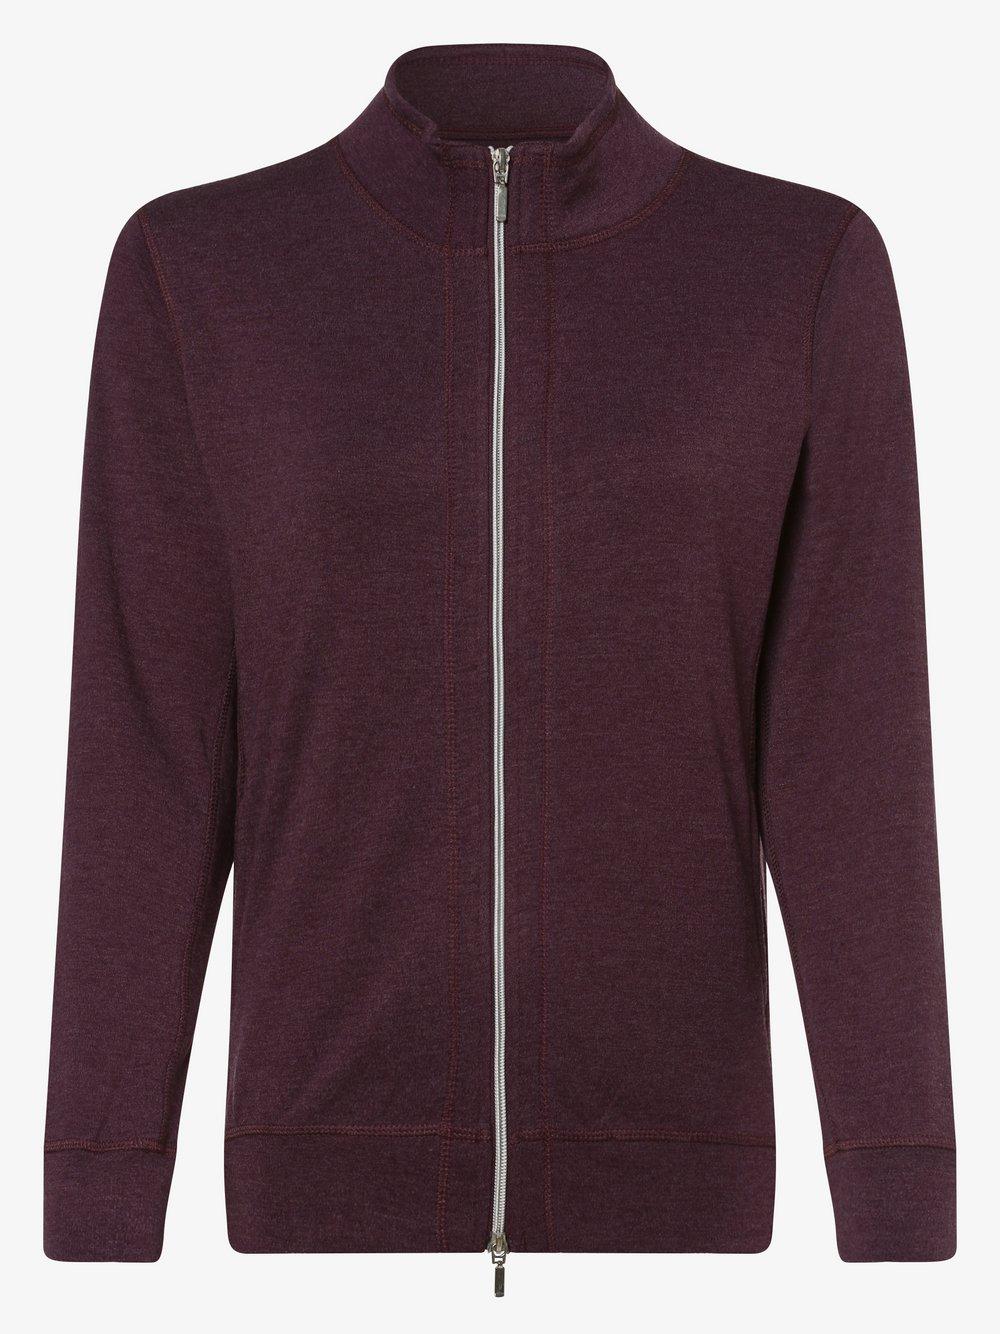 Franco Callegari - Damska bluza rozpinana, czerwony